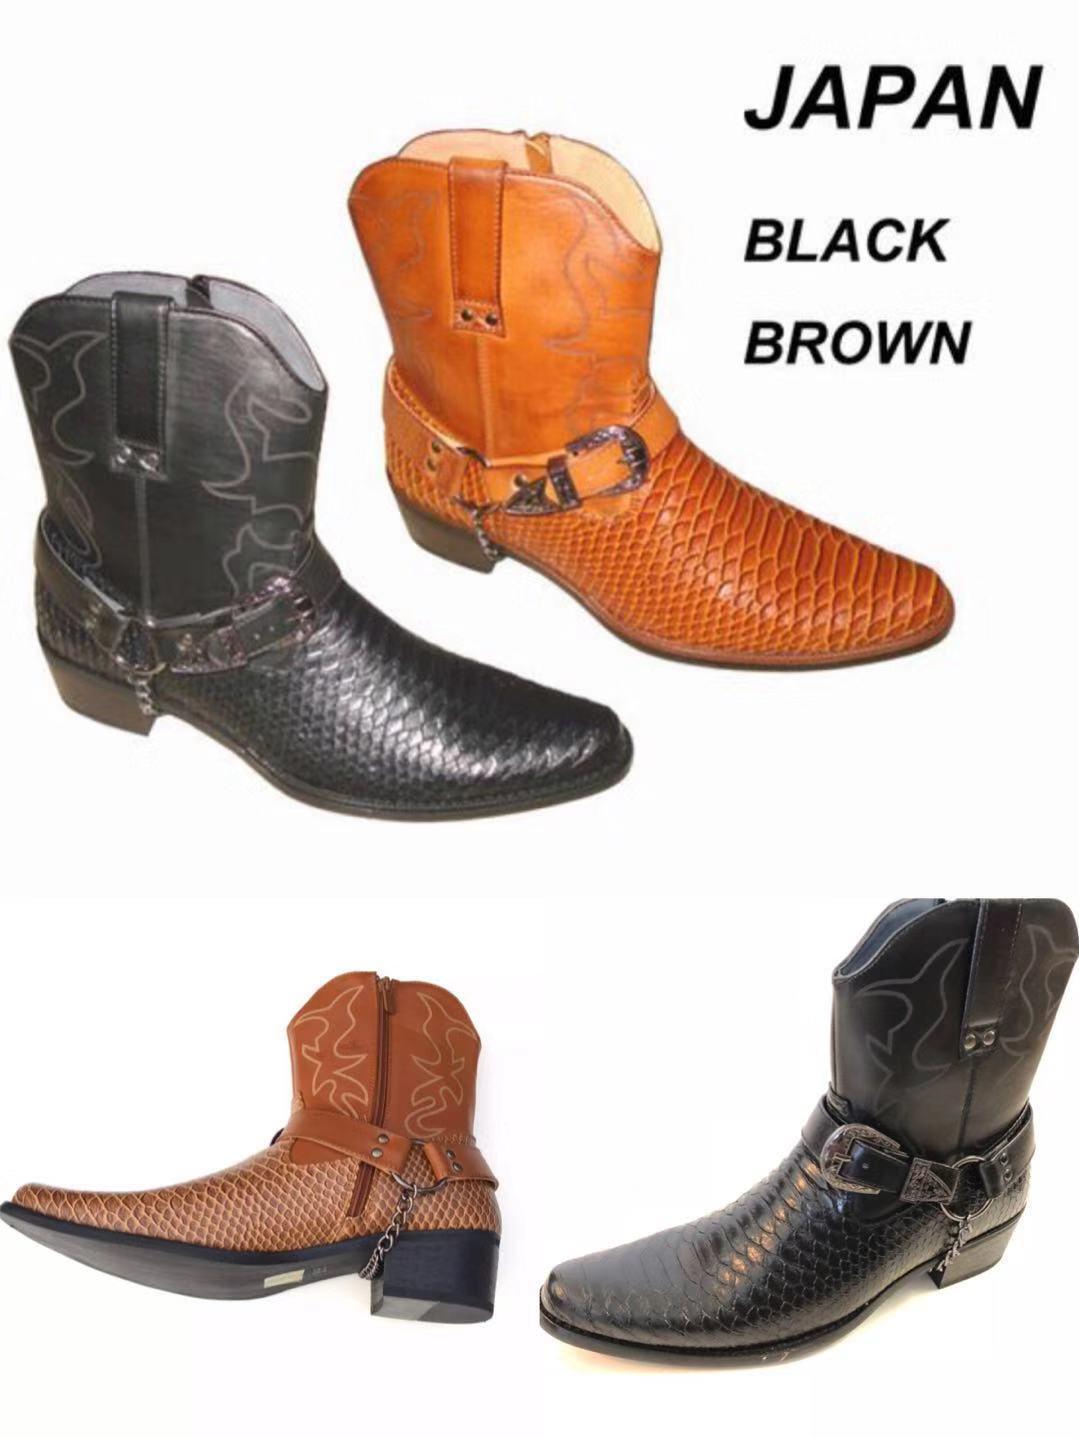 Men's Cowboy Boots Western Snake Skin Print Zippper Buckle Harness Shoes, 1